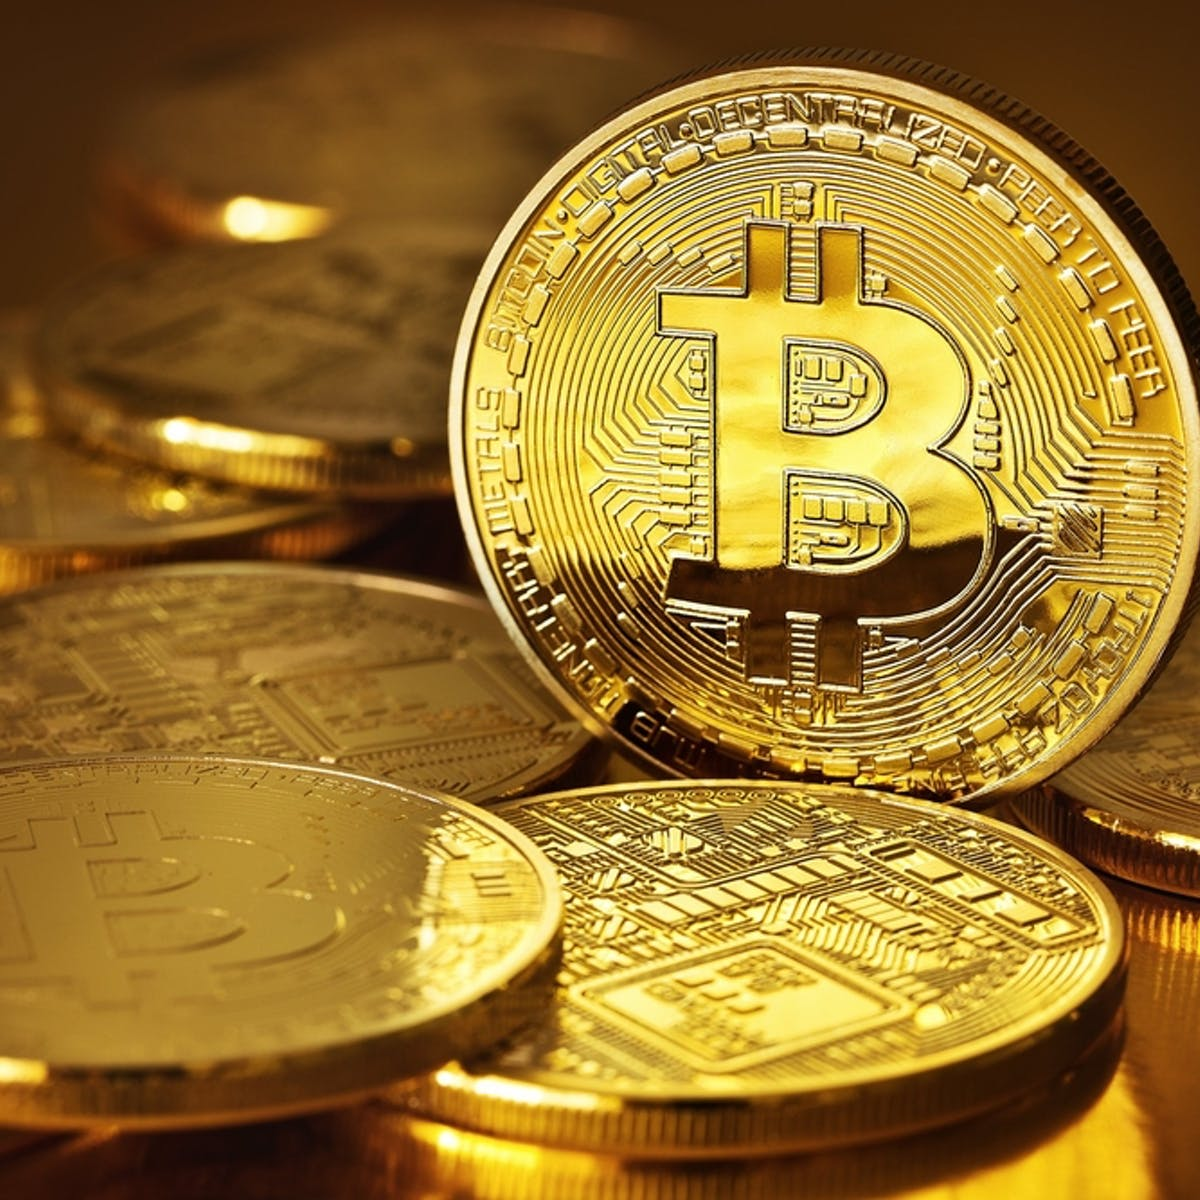 Digital coin solo mining bitcoins ecuador vs uruguay bettingexpert tipsters